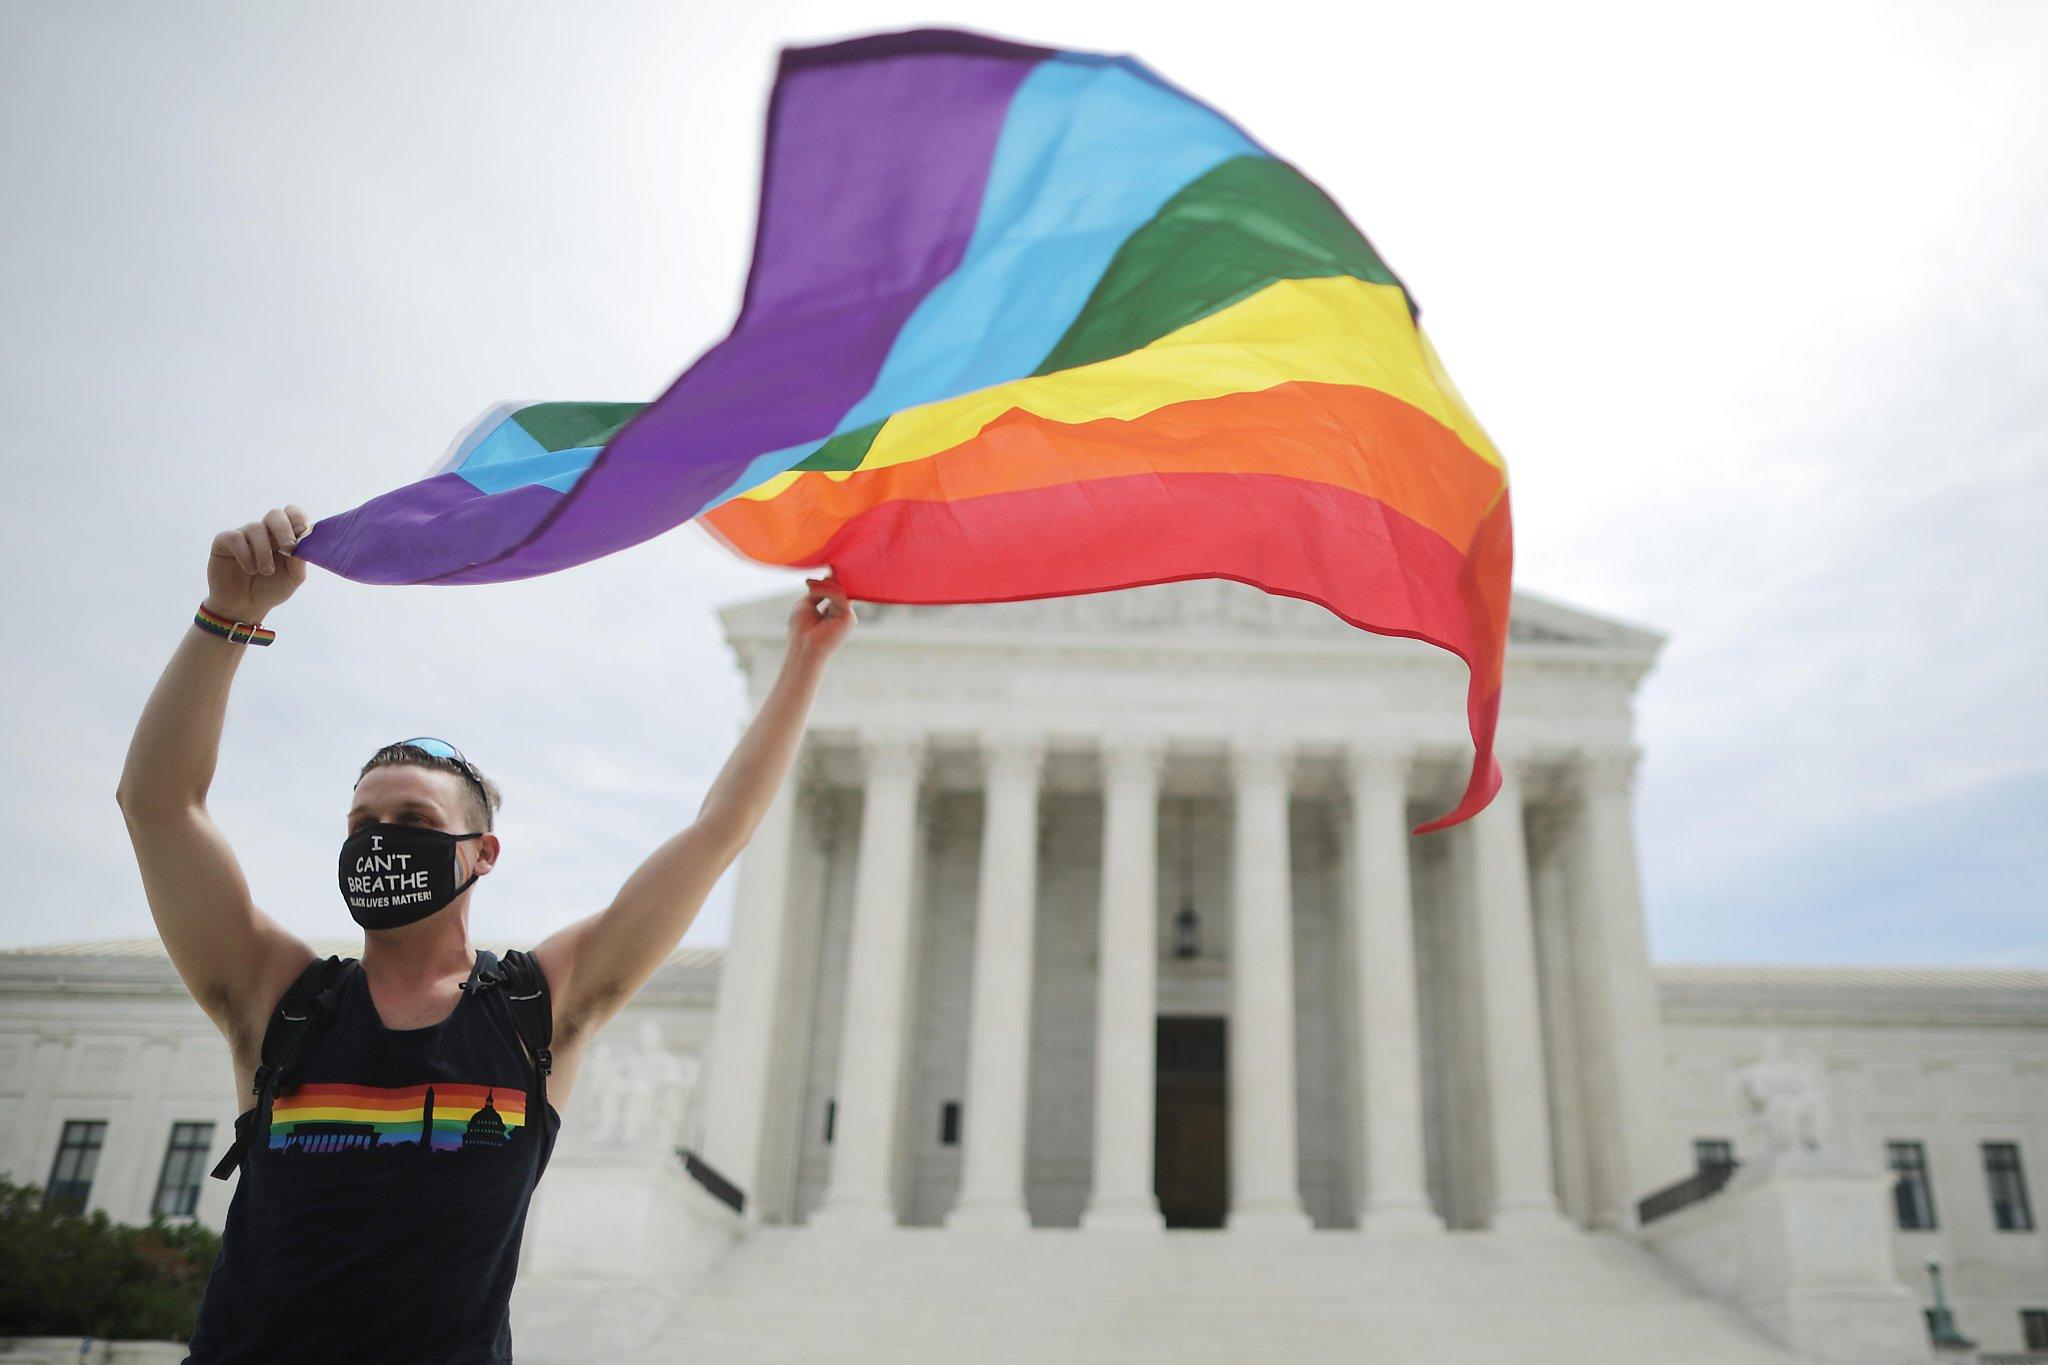 www.sfchronicle.com: GOP Senate sits on broad gay rights bill as high court bans LGBTQ job bias